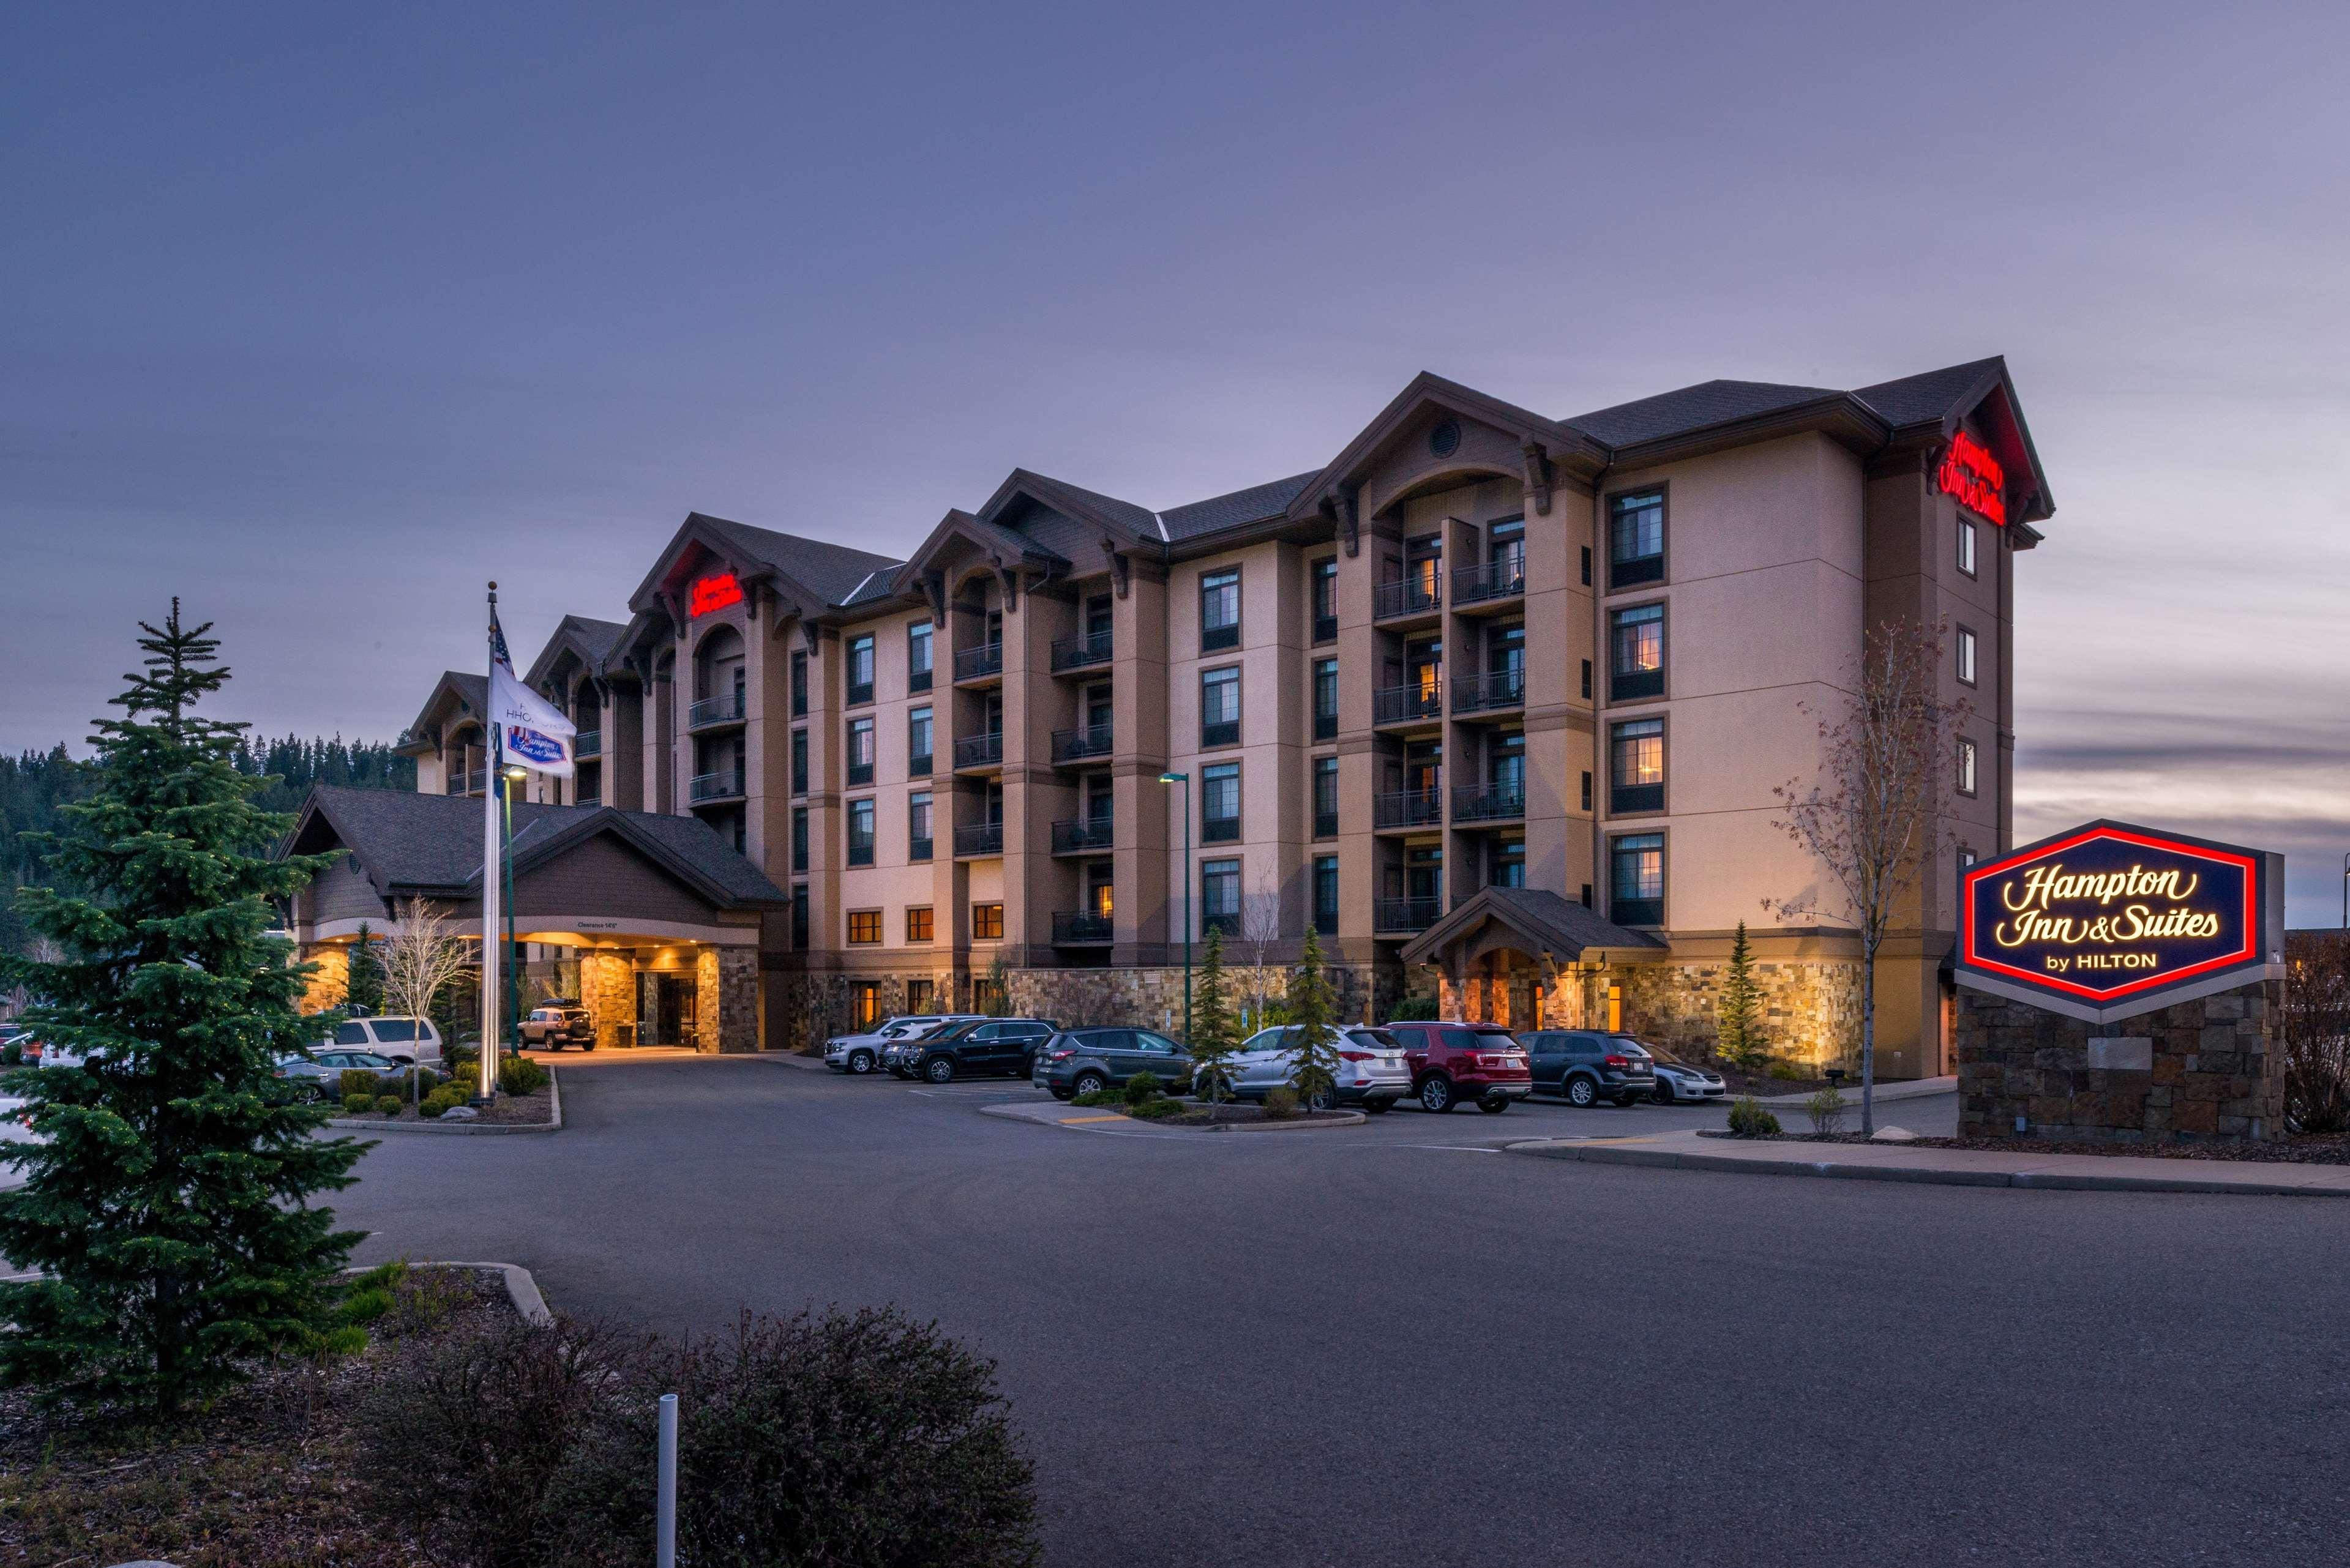 Hampton Inn & Suites Coeur d' Alene image 1